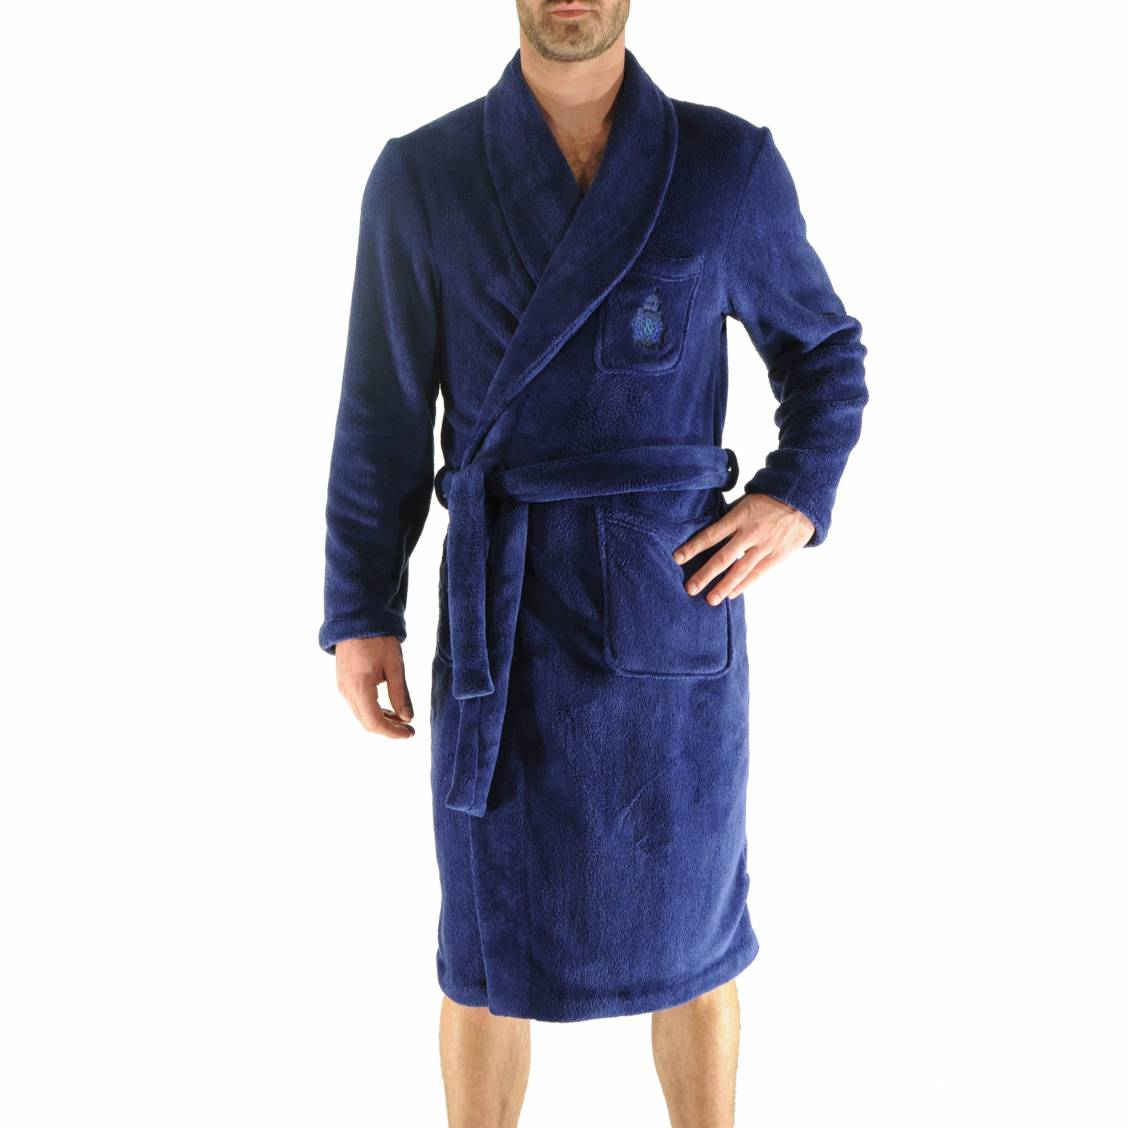 Robe de chambre fille walmart 211407 la for Deco maison walmart